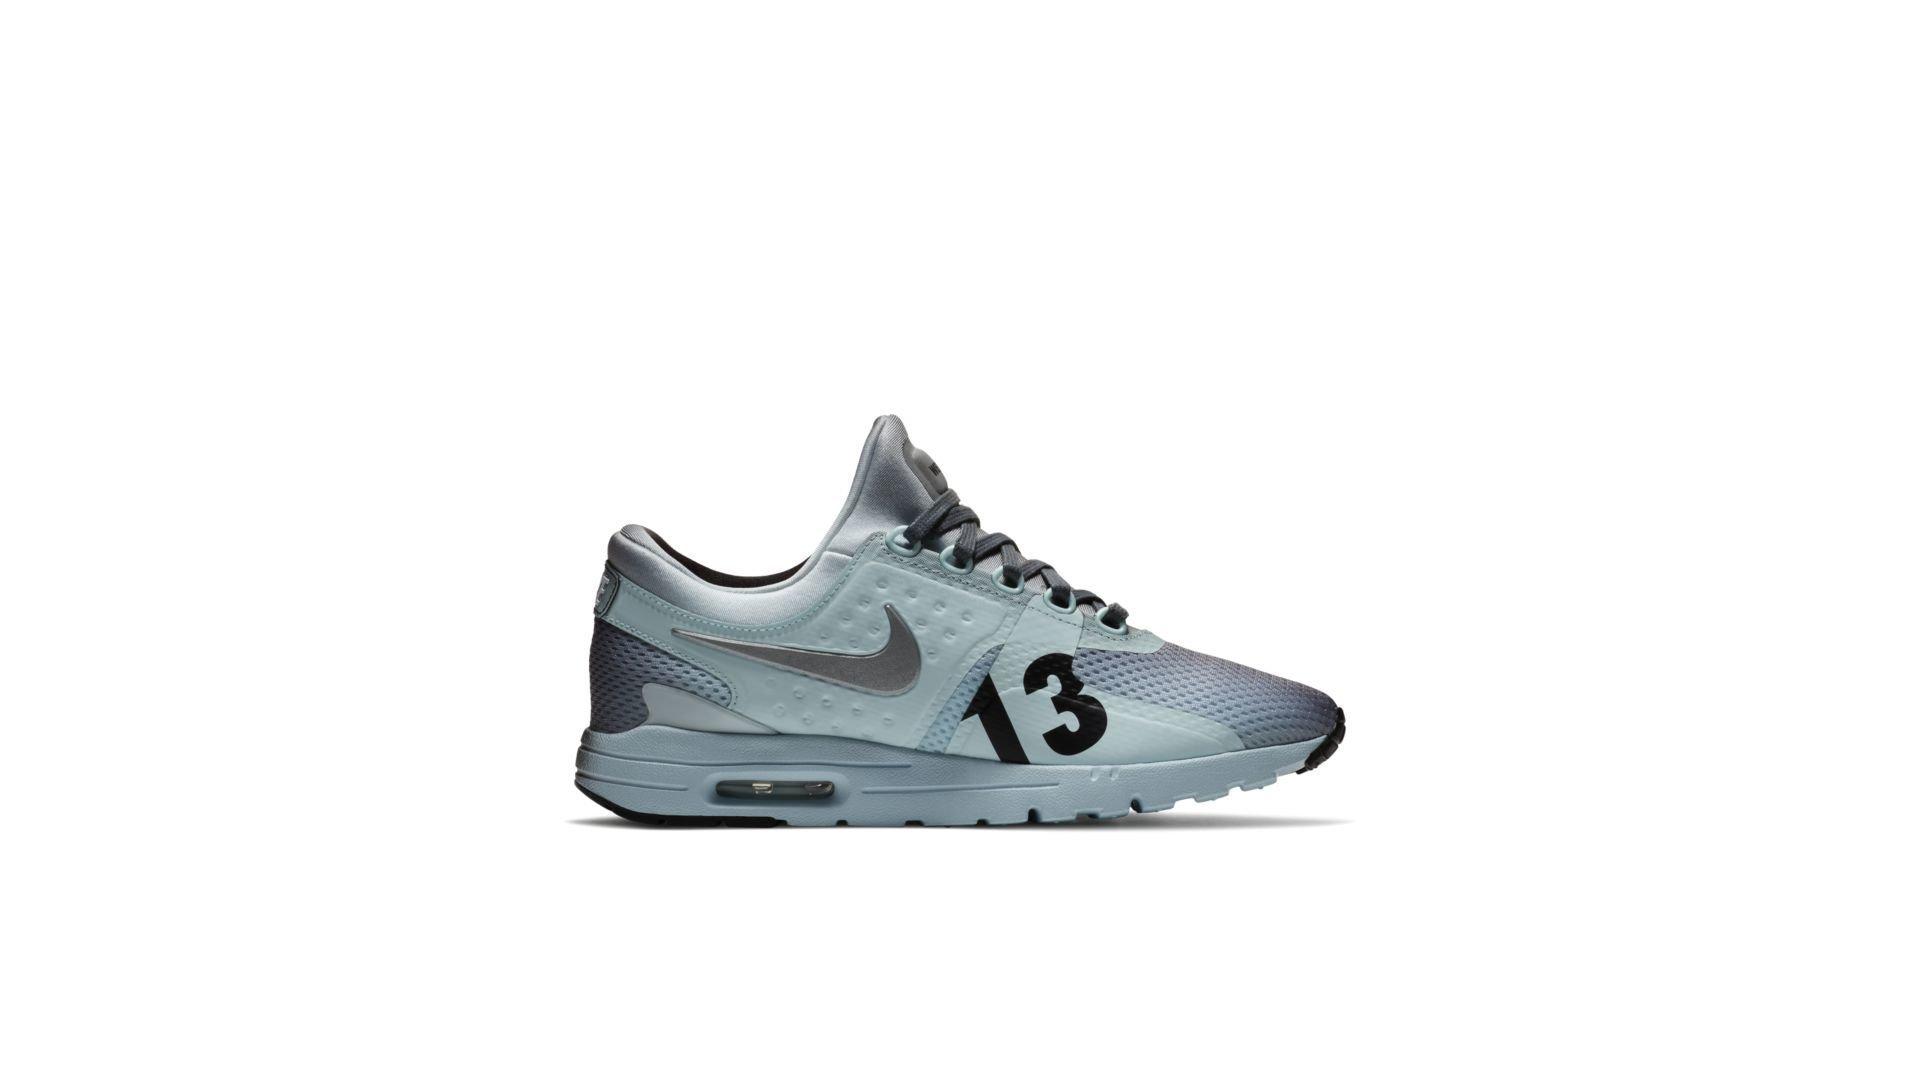 Nike Air Max Zero Imaginairs Kaycee Rice (GS) (AJ6702 001